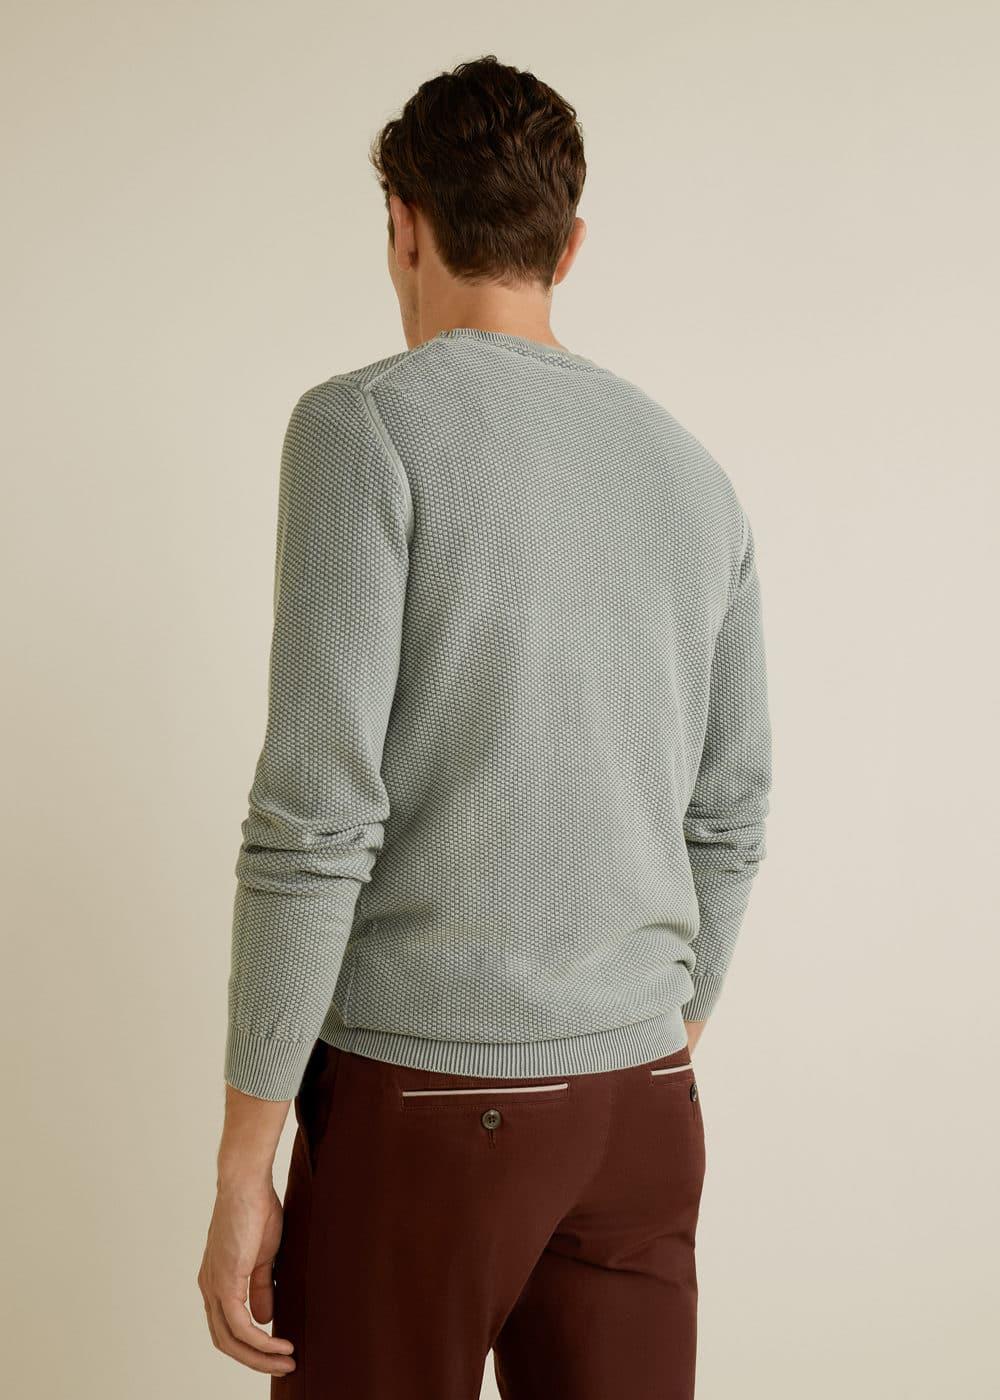 Mango - Structured cotton sweater - 2